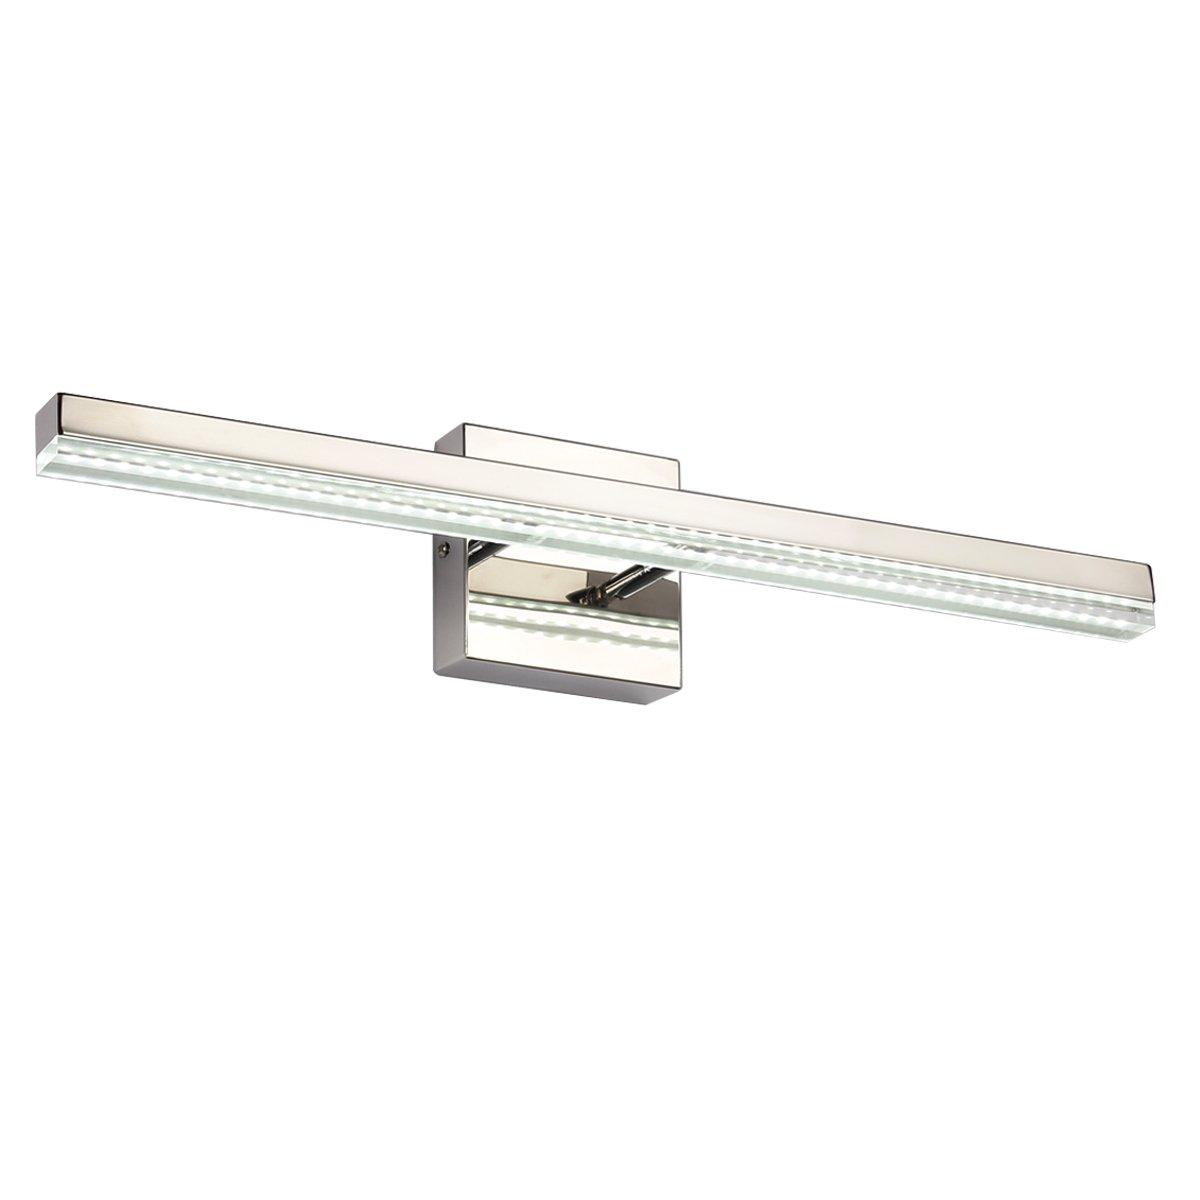 Dailyart 10W Cool White Tube LED Bathroom Light Mirror Light Vanity Light, 3528 SMD, Stainless Steel + Acrylic, IP44